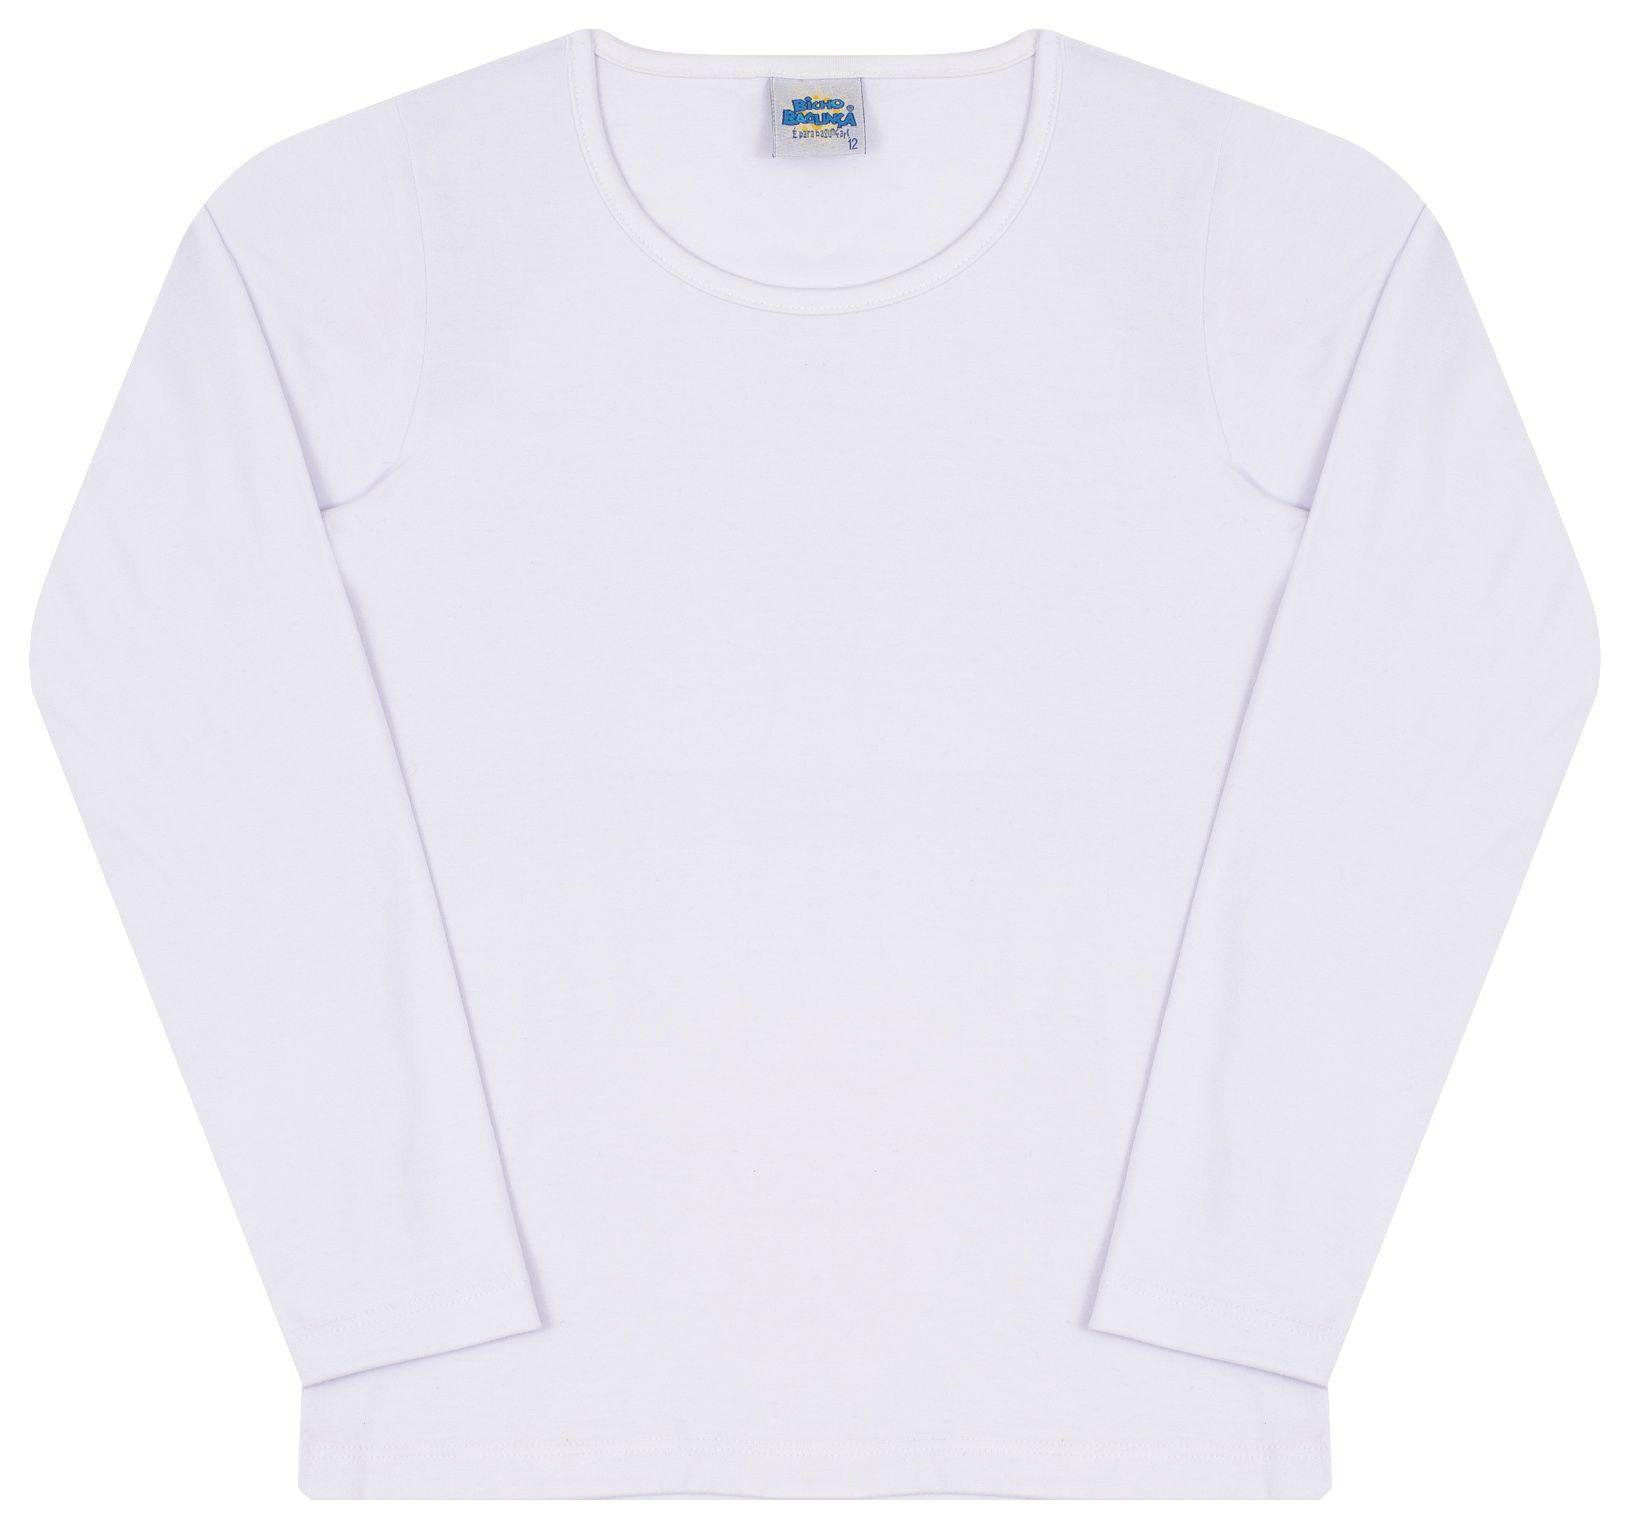 Camiseta Manga Longa Branca Menina Bicho Bagunça